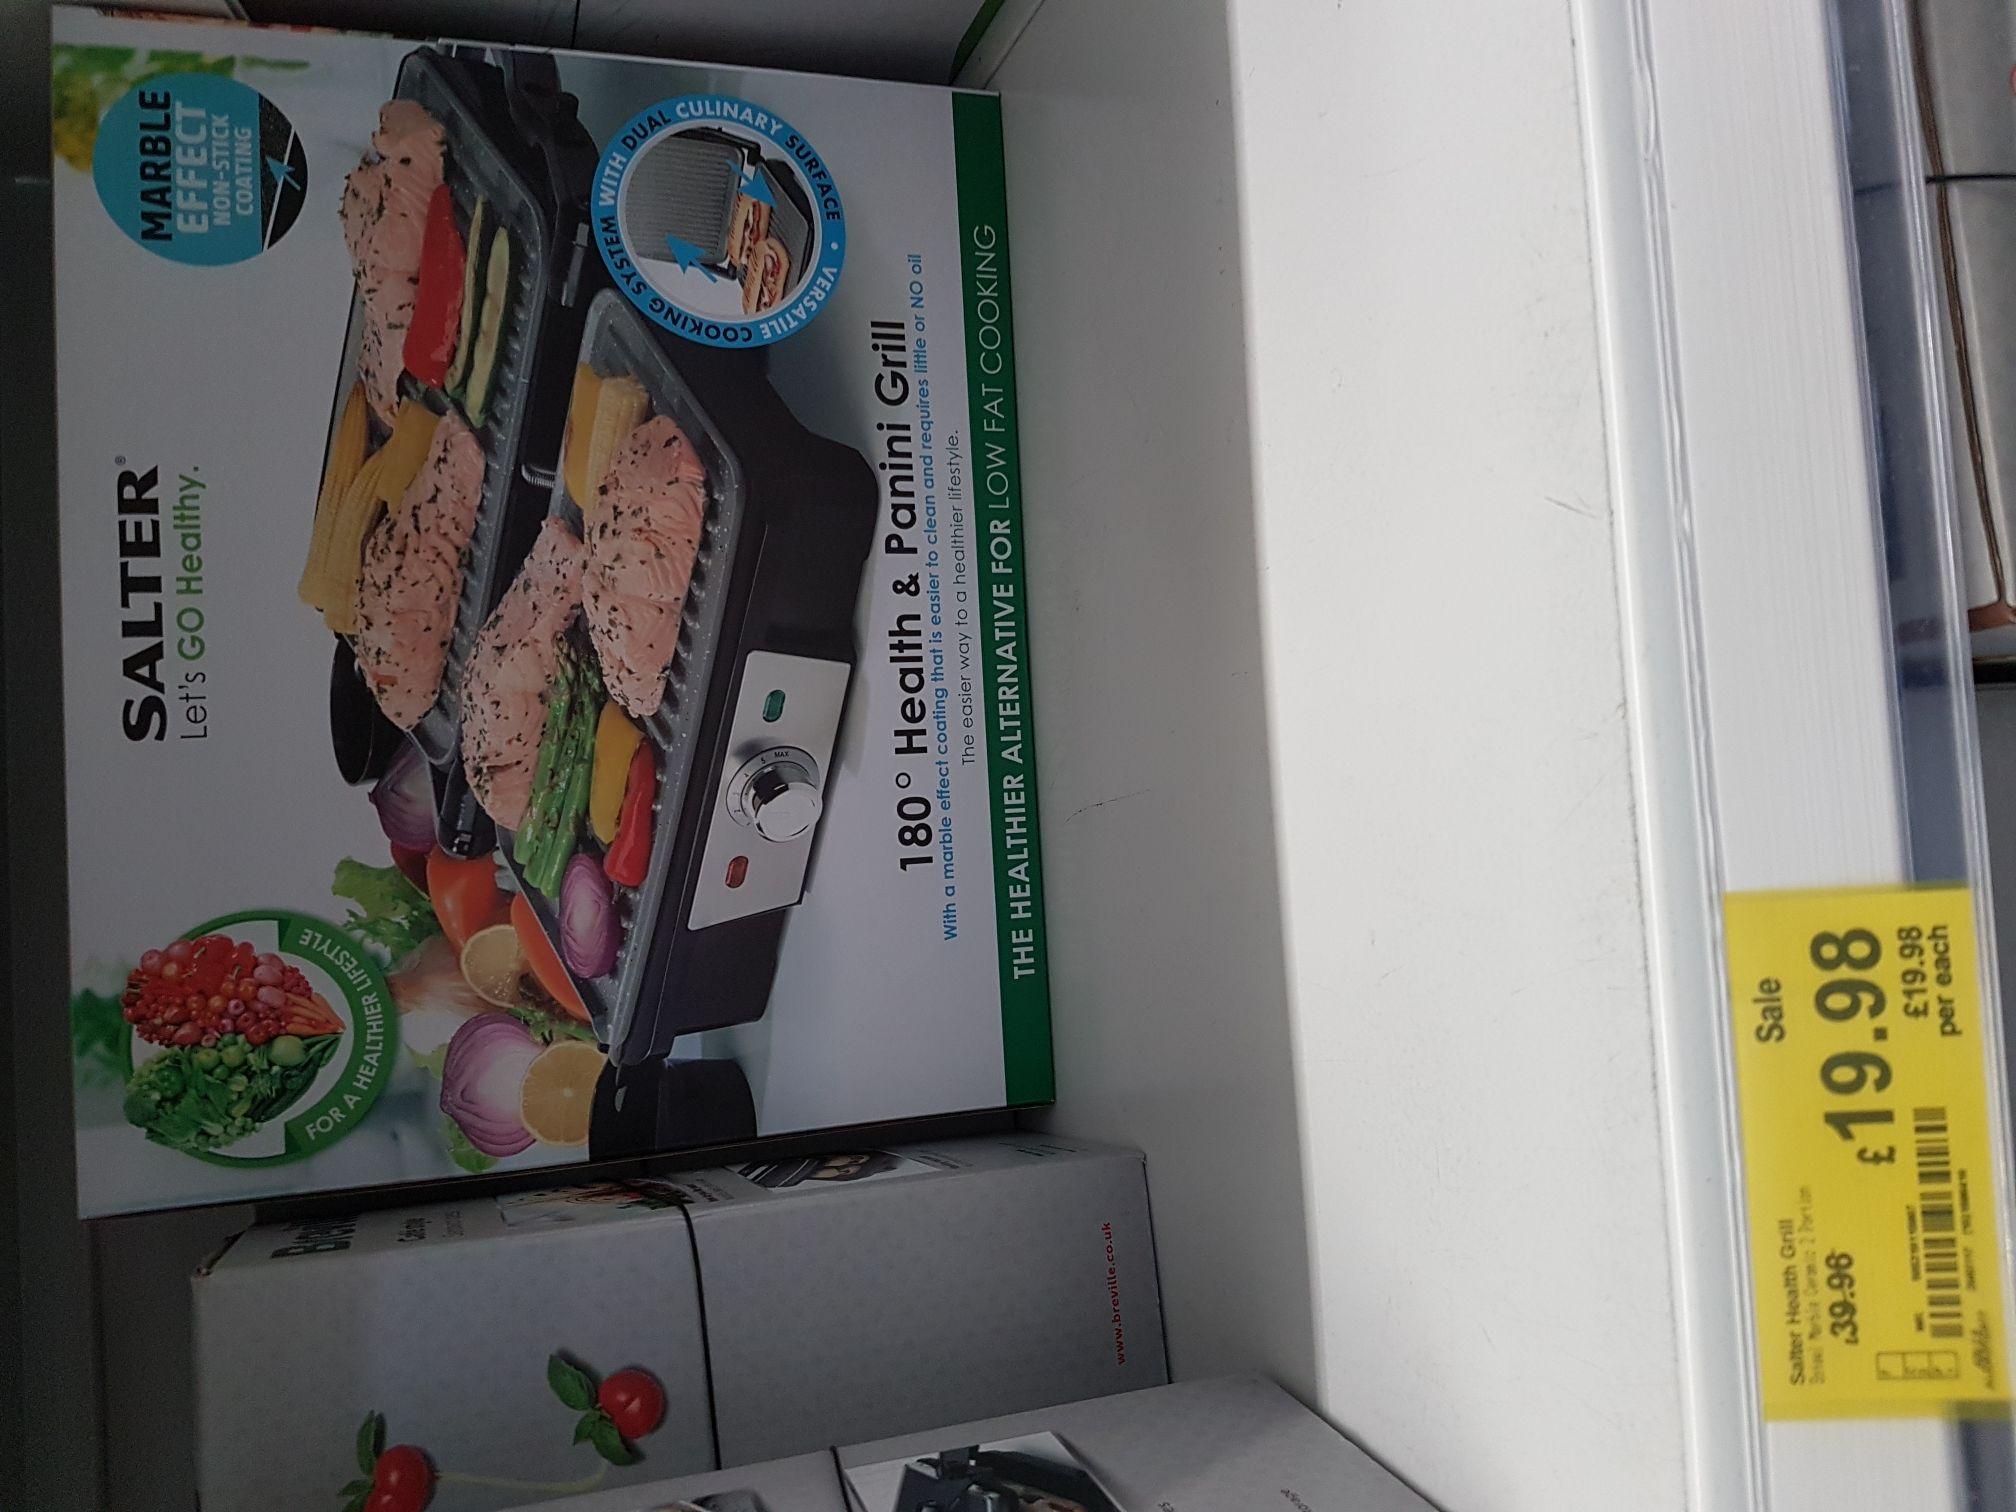 Salter Panini Grill 180° £19.99 HALF PRICE ADSA